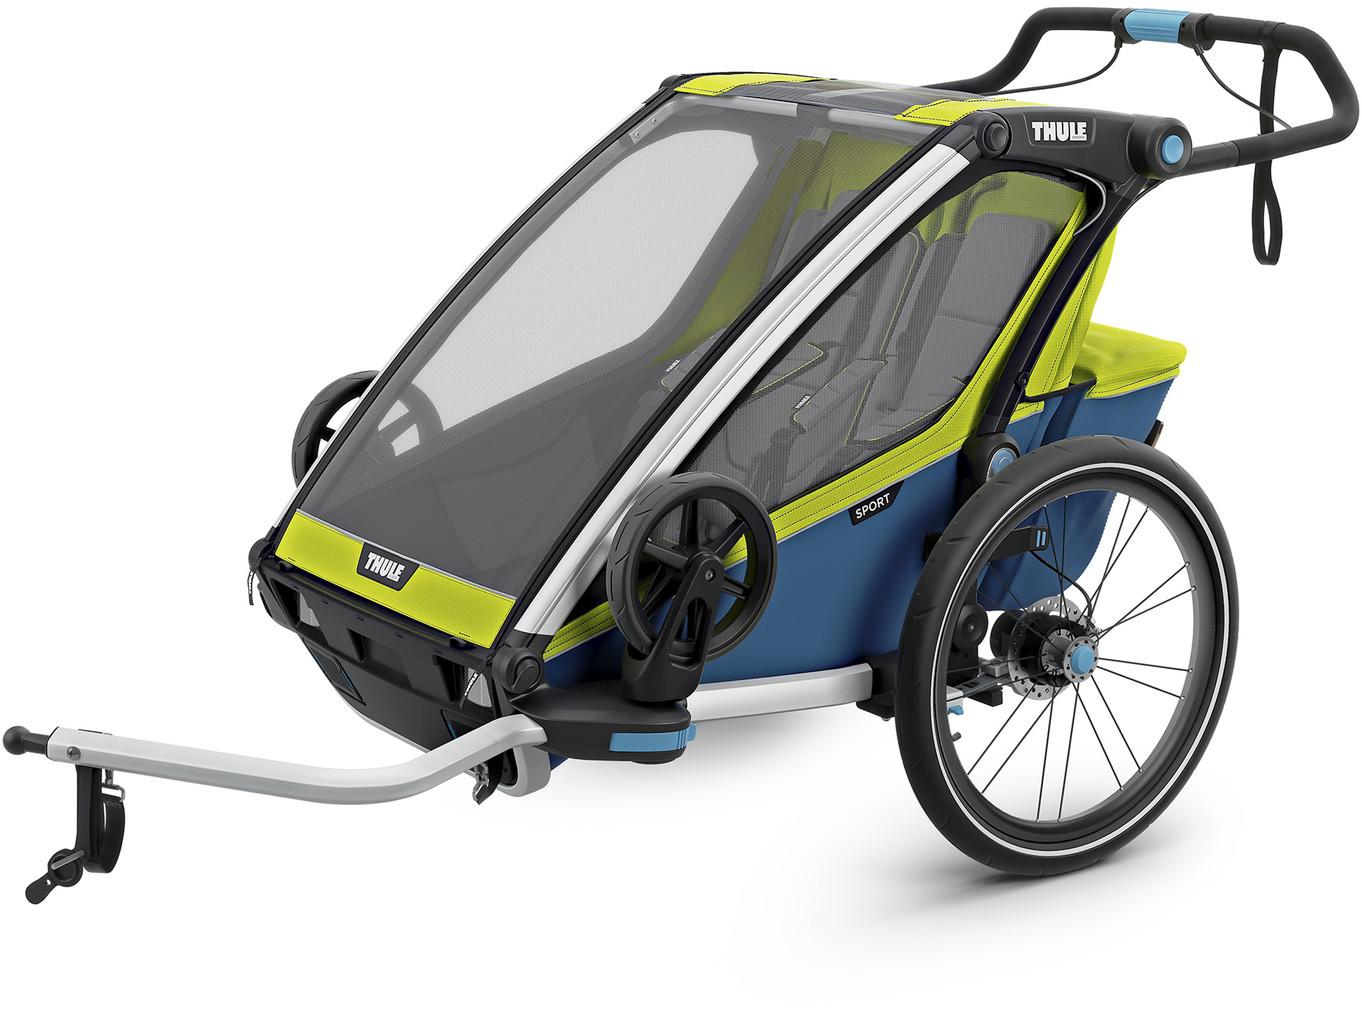 Thule Chariot Sport2 2019 zielony/niebieski TH/10201016